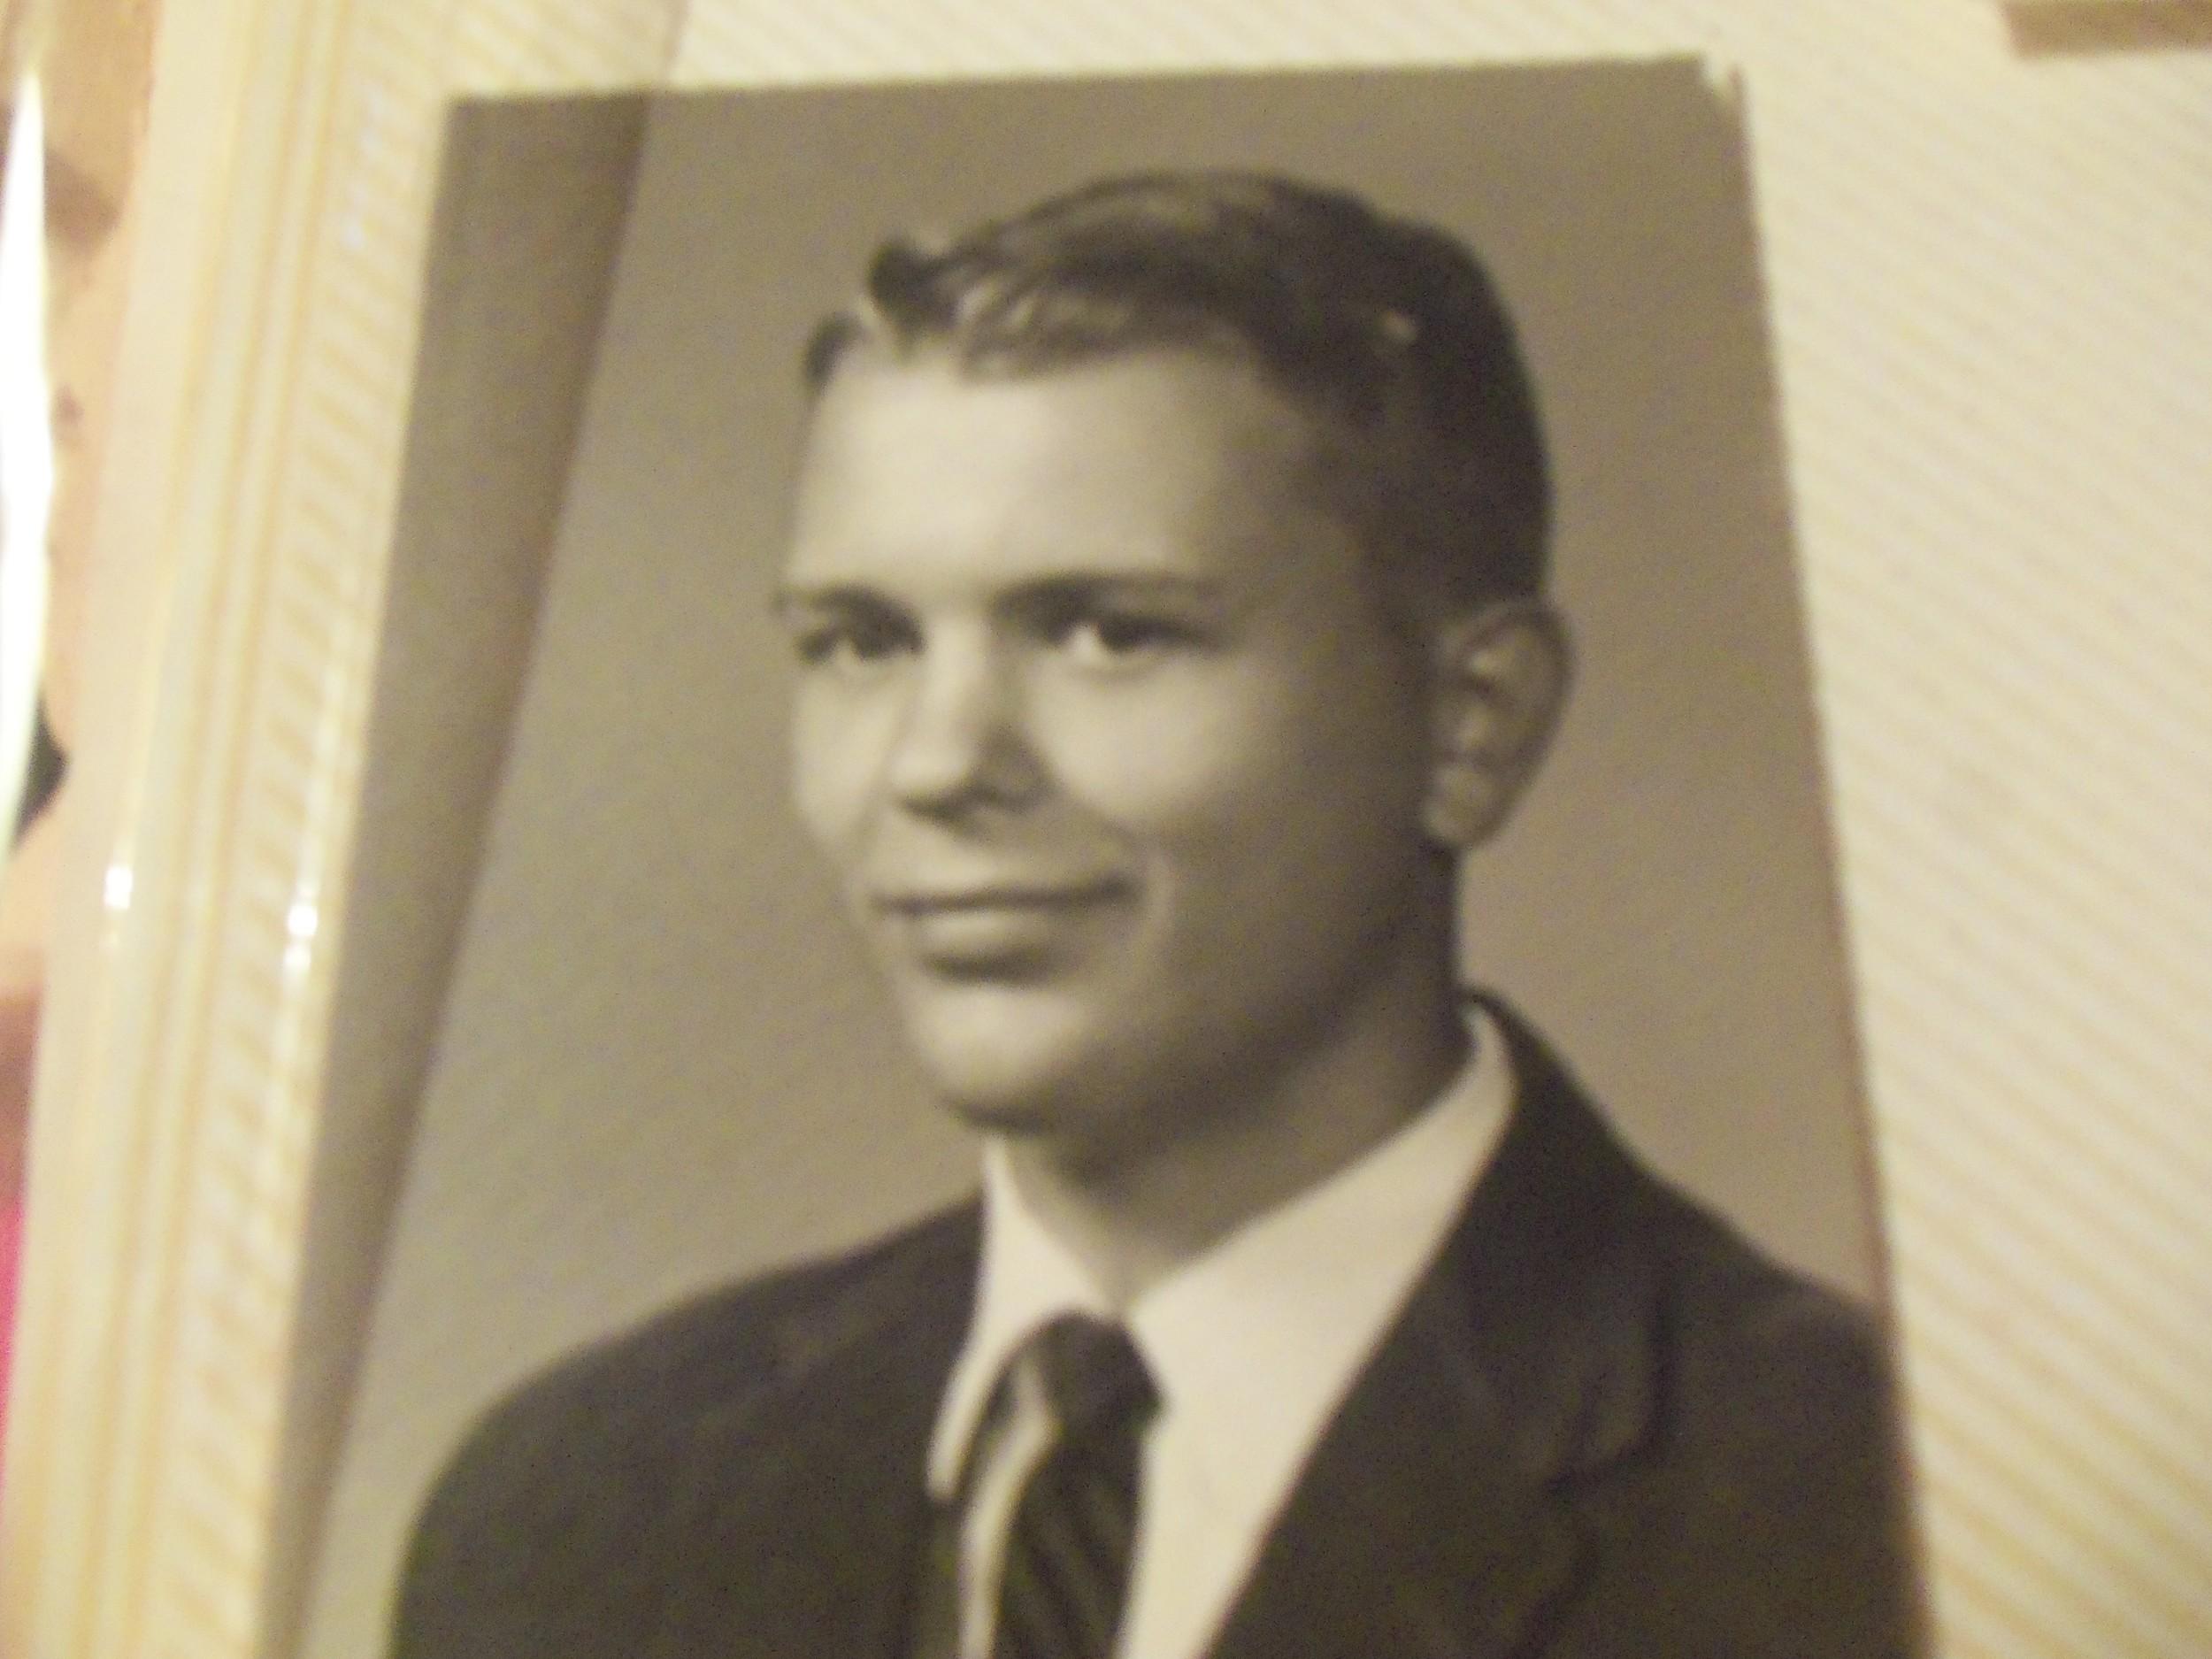 THOMAS ALEXANDER (SANDY) STORRIE1966 TUCUMCARI, NEW MEXICO